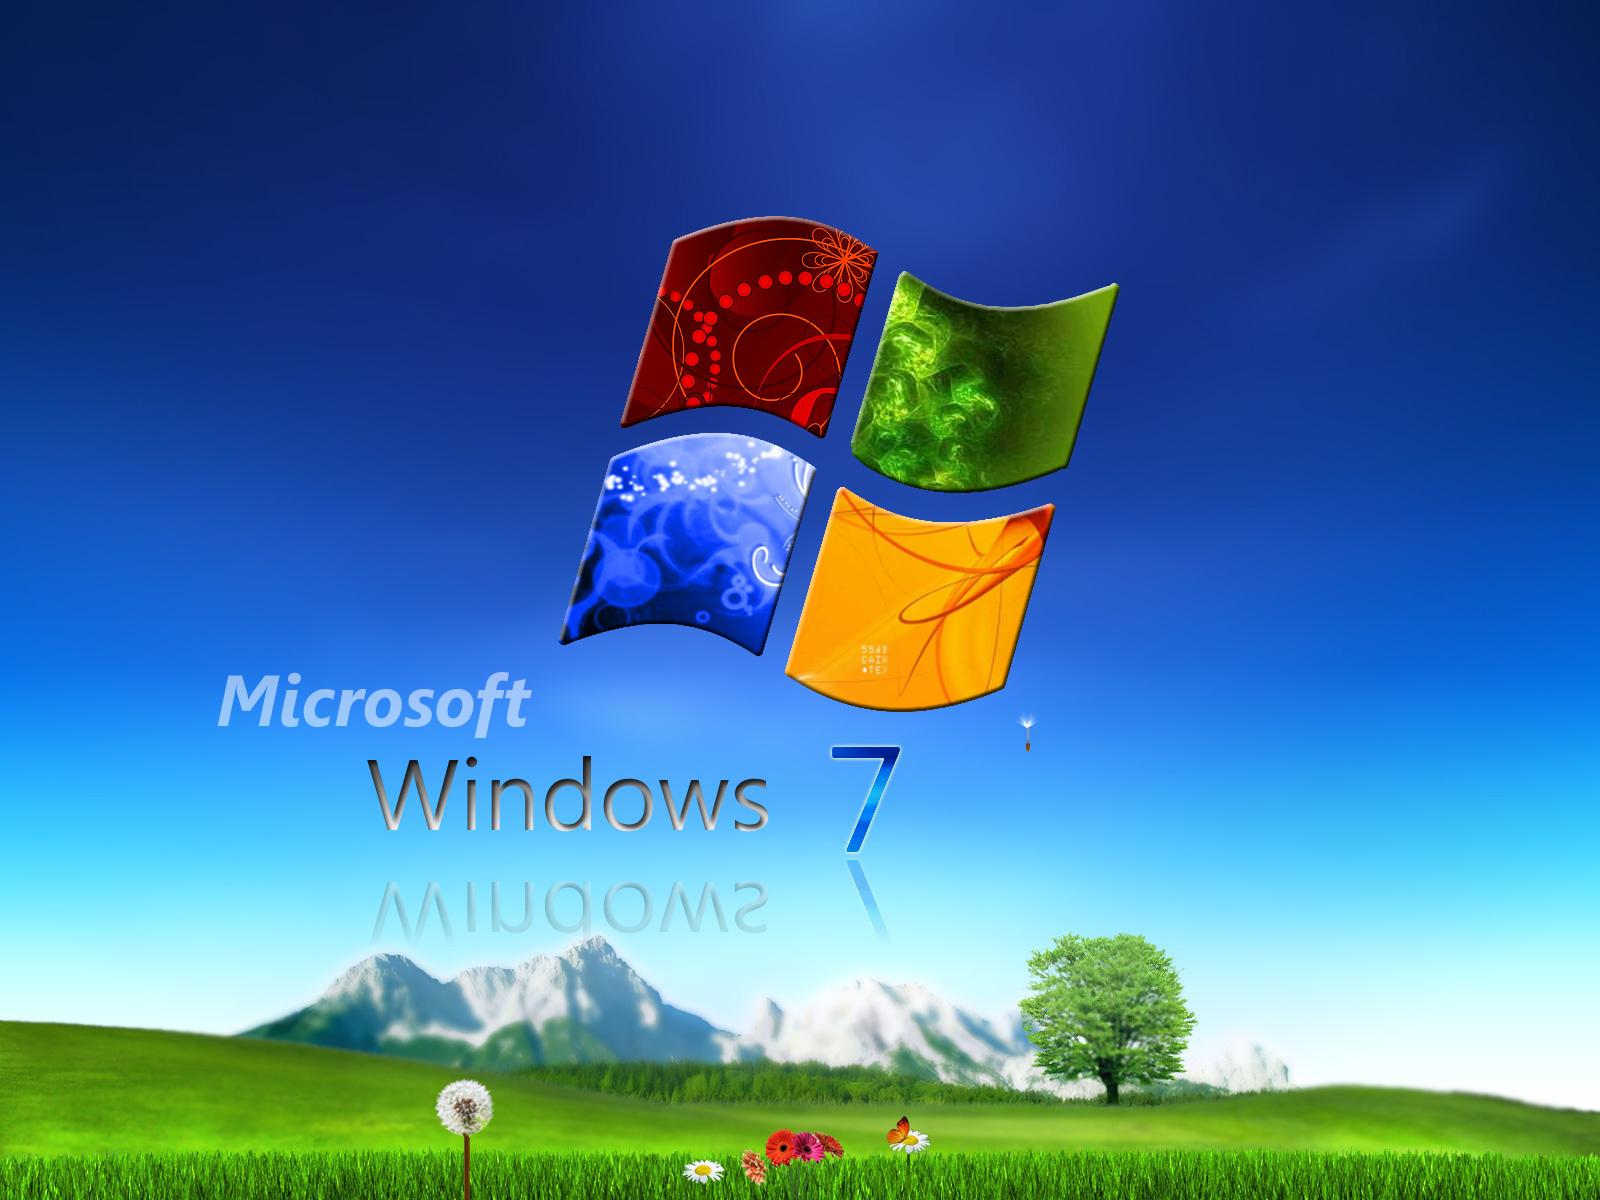 http://3.bp.blogspot.com/-vbMSxBwicDw/T-ndMLPleDI/AAAAAAAABqw/xWhAn8QiCTA/s1600/Windows+7+Wallpapers1.jpg